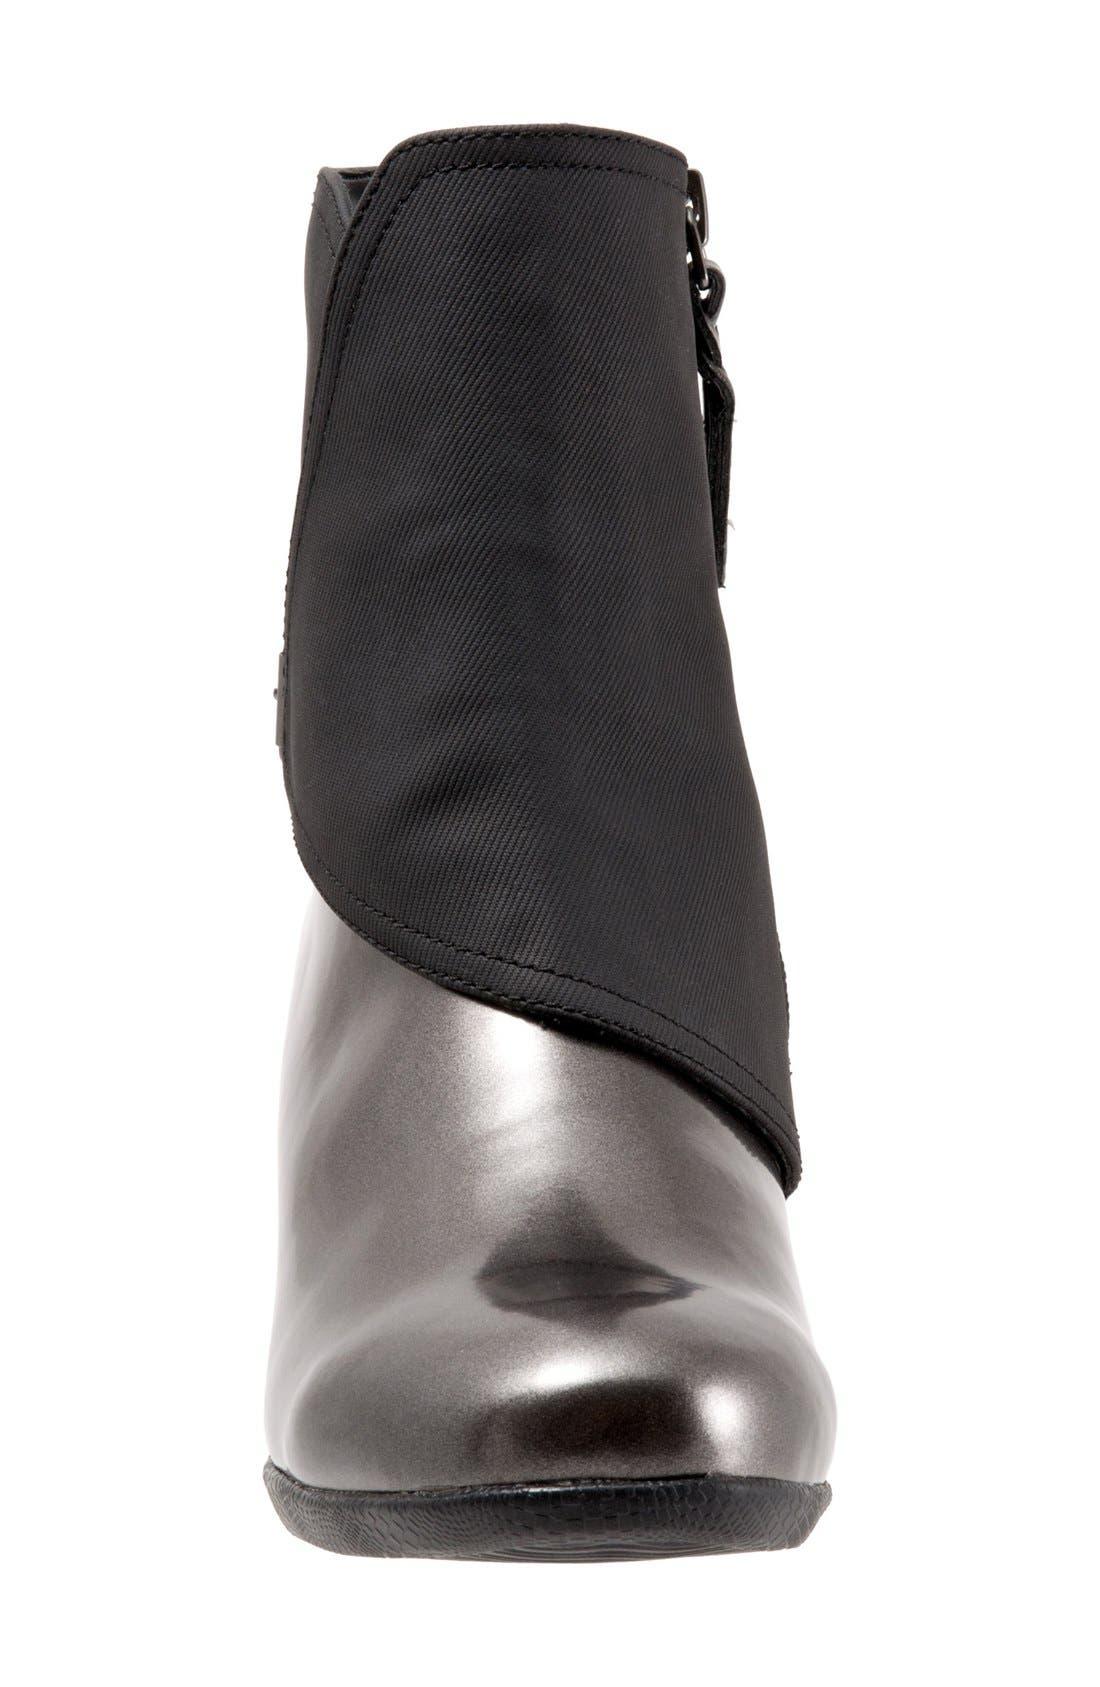 Alternate Image 3  - Trotters 'Stormy' Waterproof Bootie (Women)